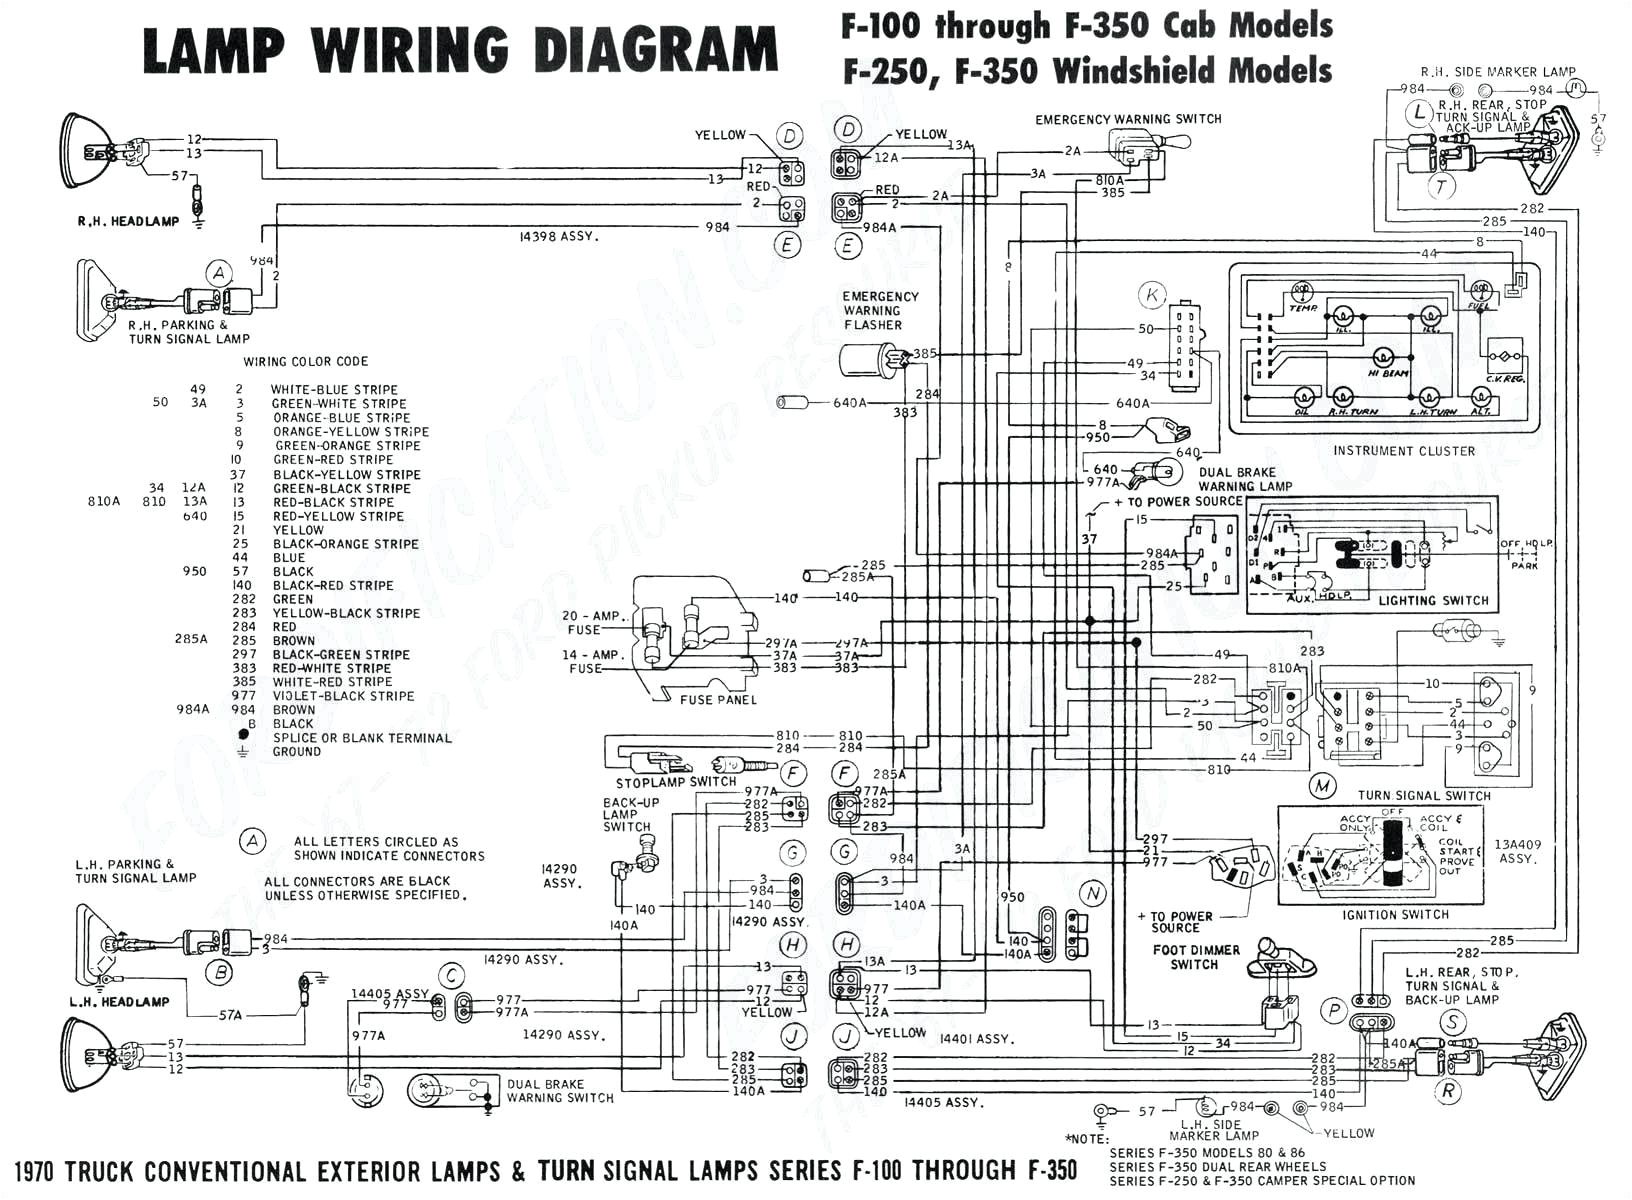 Starter Wiring Diagram Chevy 89 ford Starter Wiring Diagram Wiring Diagram Database